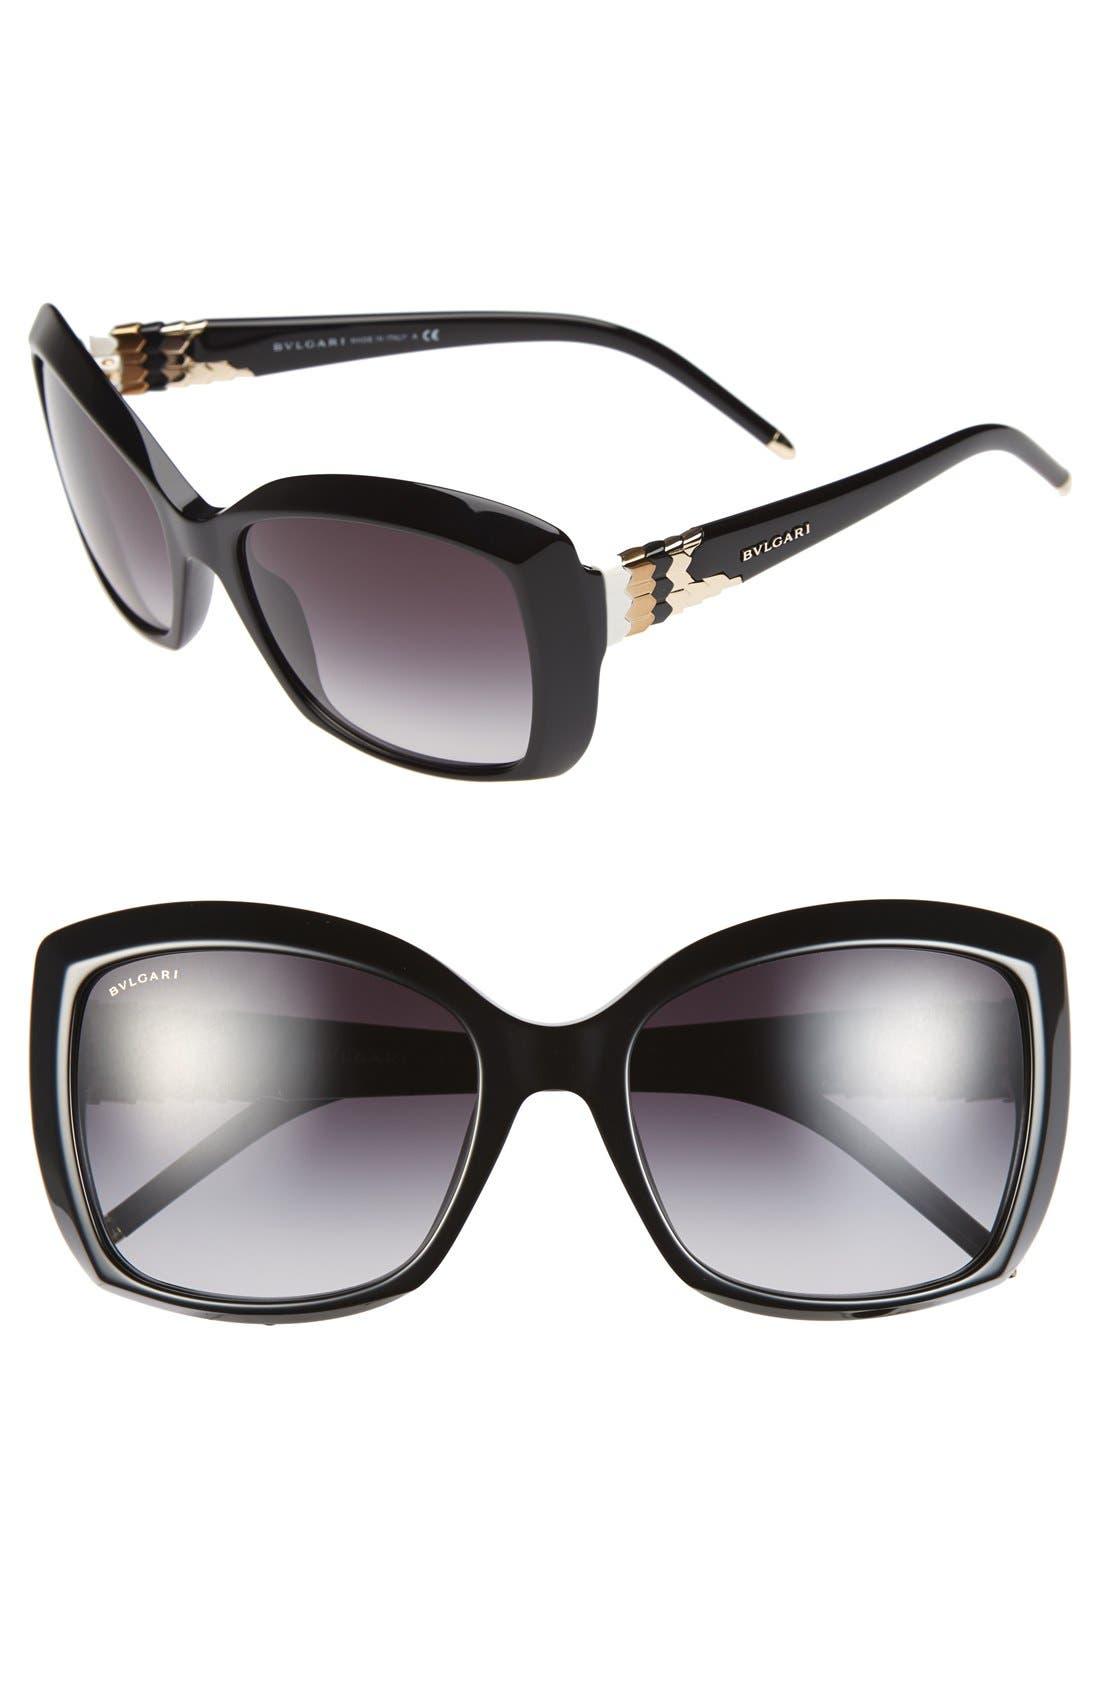 Main Image - BVLGARI 56mm Square Sunglasses